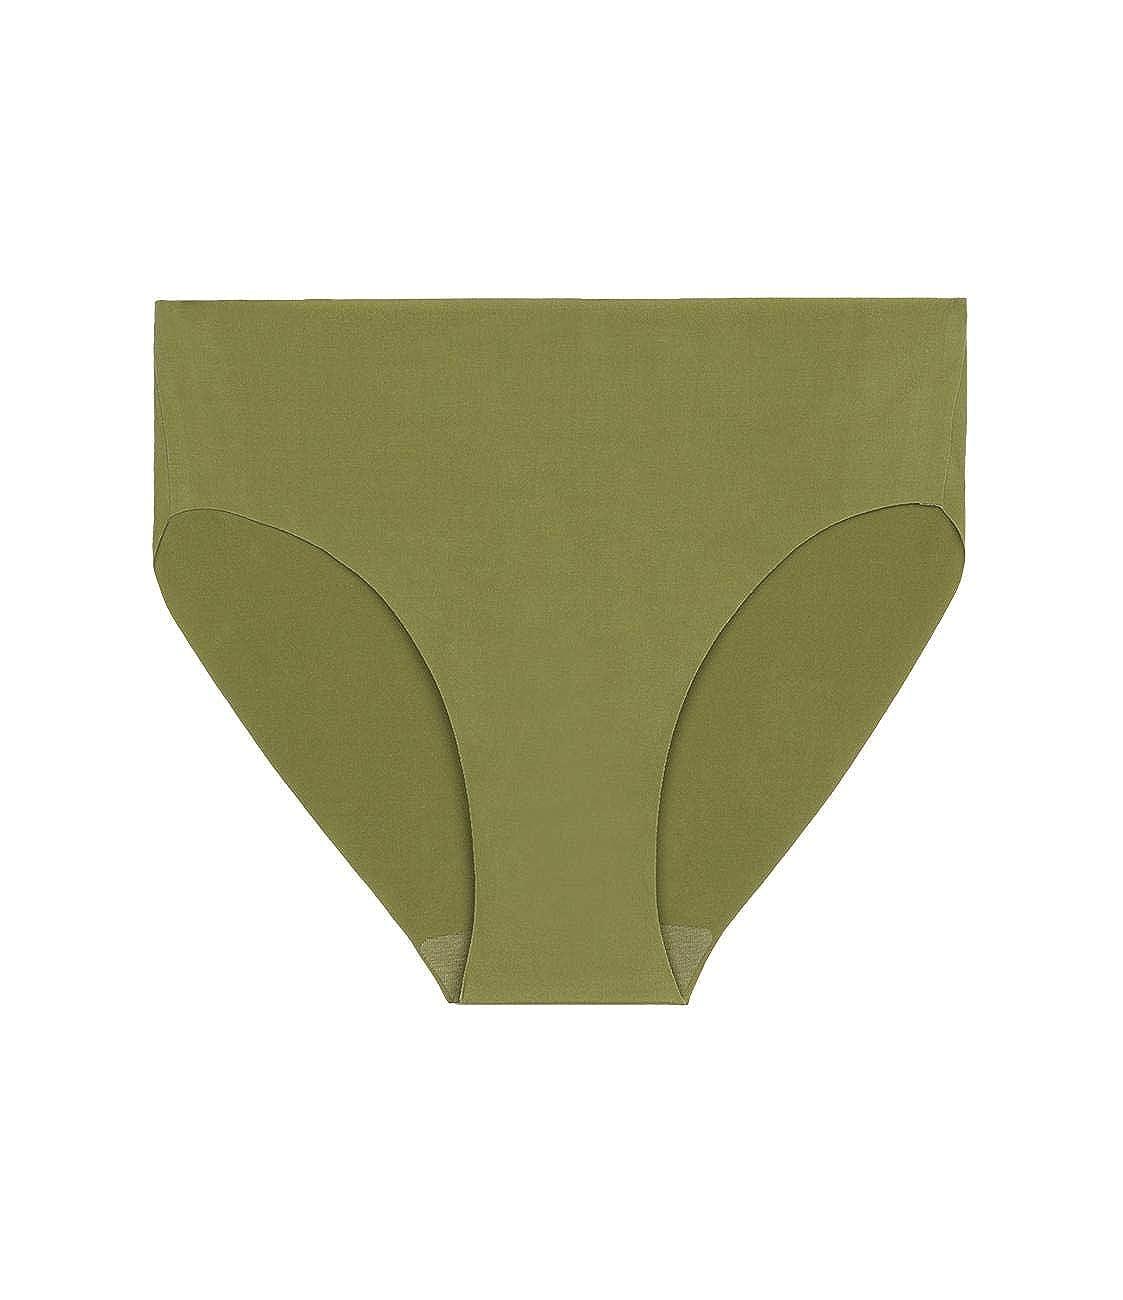 ff266190dae4 Intimissimi Womens Seamless Microfibre Snug-Fit Panties: Amazon.co.uk:  Clothing